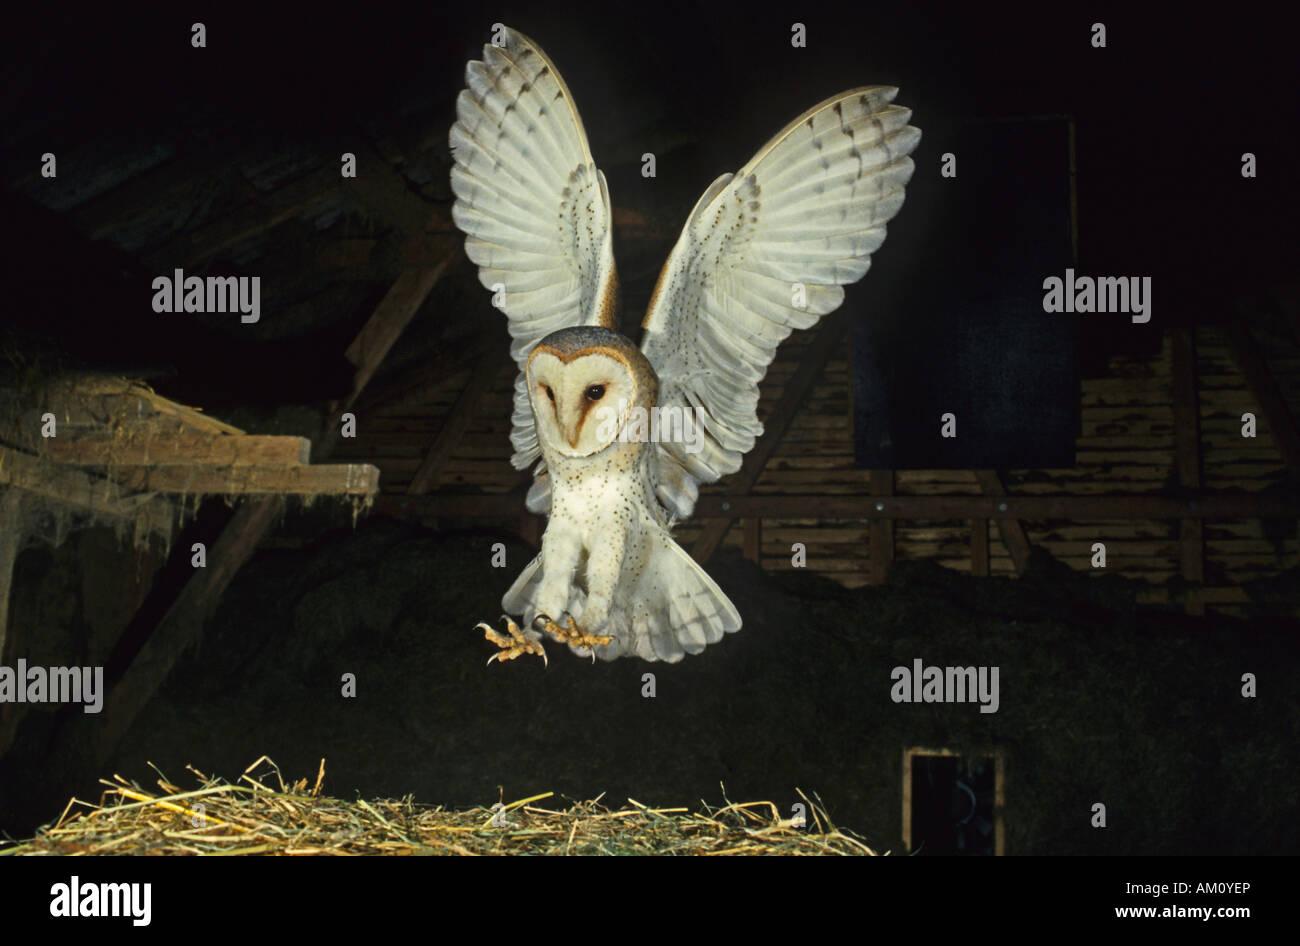 Lechuza, Tyto alba, aterrizaje Imagen De Stock